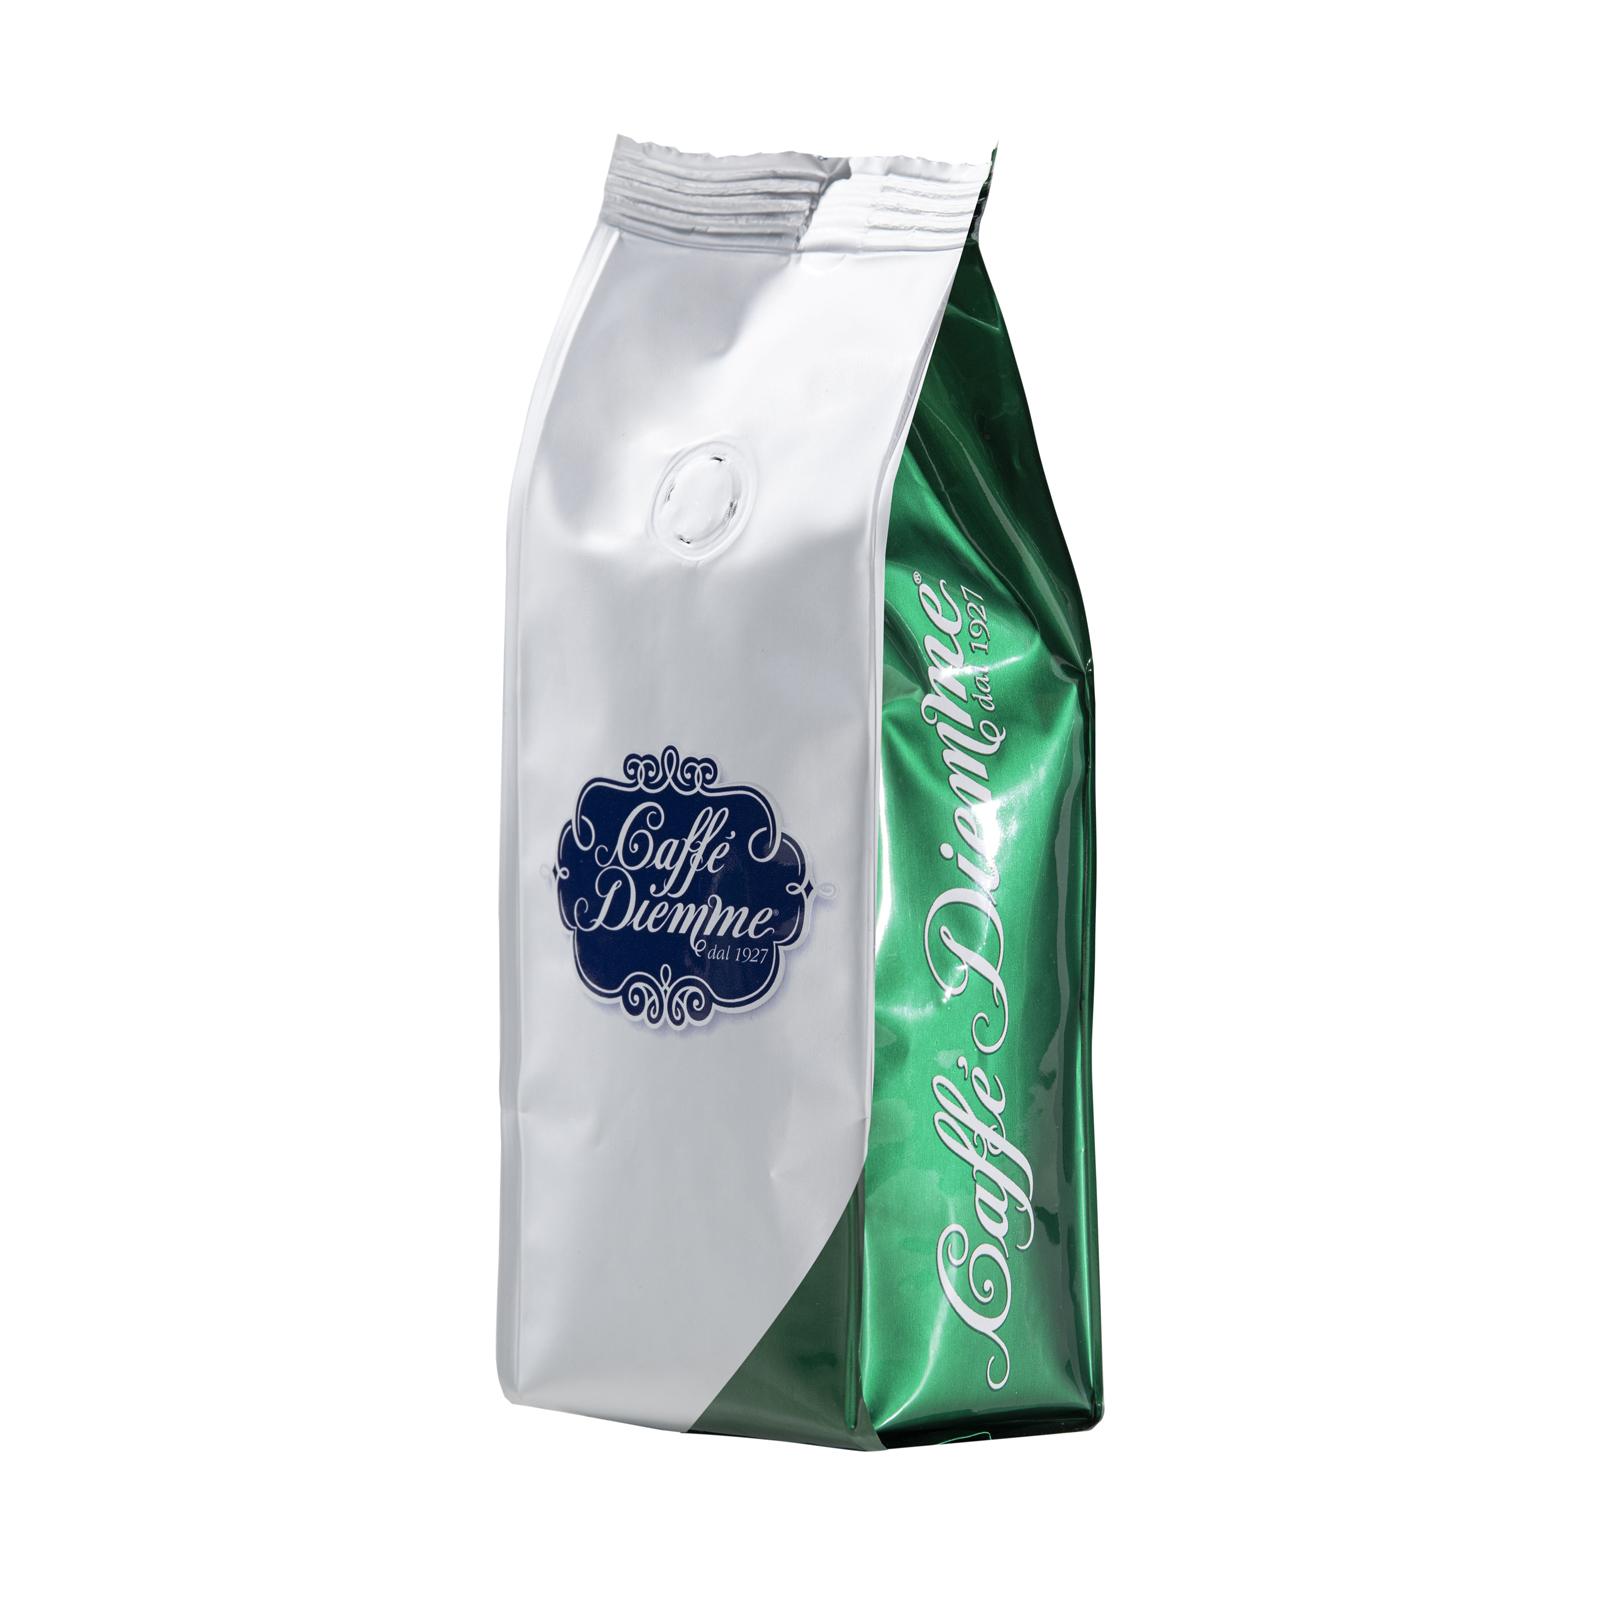 Кофе в зернах Caffe Diemme Miscela Aromatica 200 г кофе в зернах caffe diemme miscela oro арабика 500 г